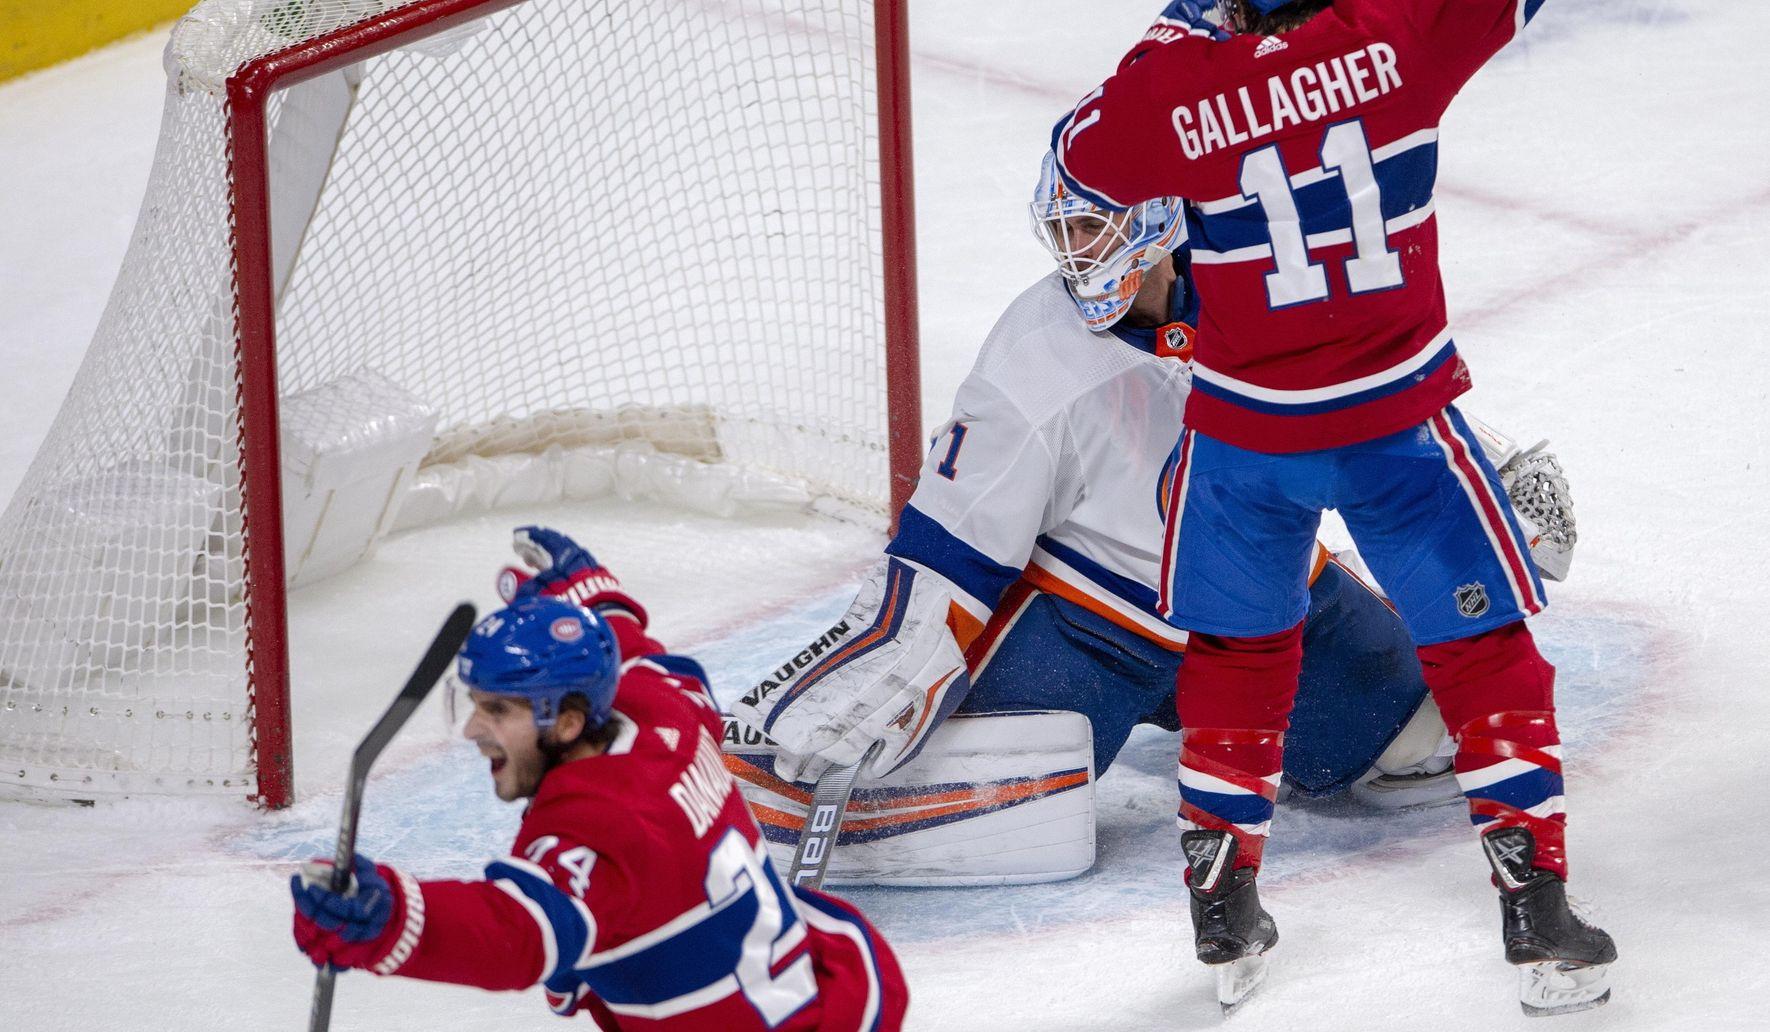 Islanders_canadiens_hockey_88160_c0-355-3630-2471_s1770x1032